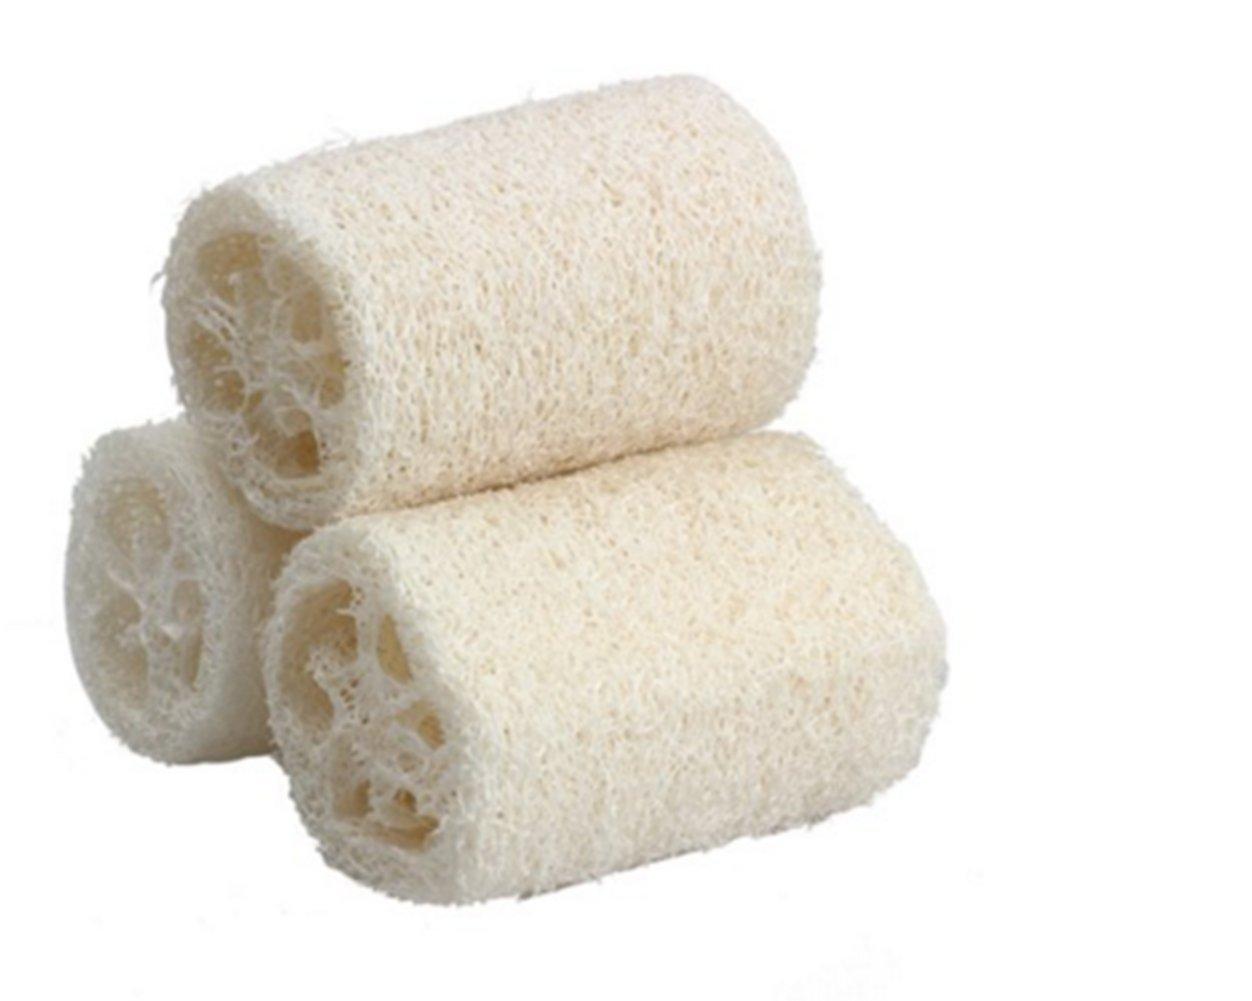 Qingsun 3 pcs Natural Loofah Bath Body Shower Loofahs Bath Rub Sponge Scrubber